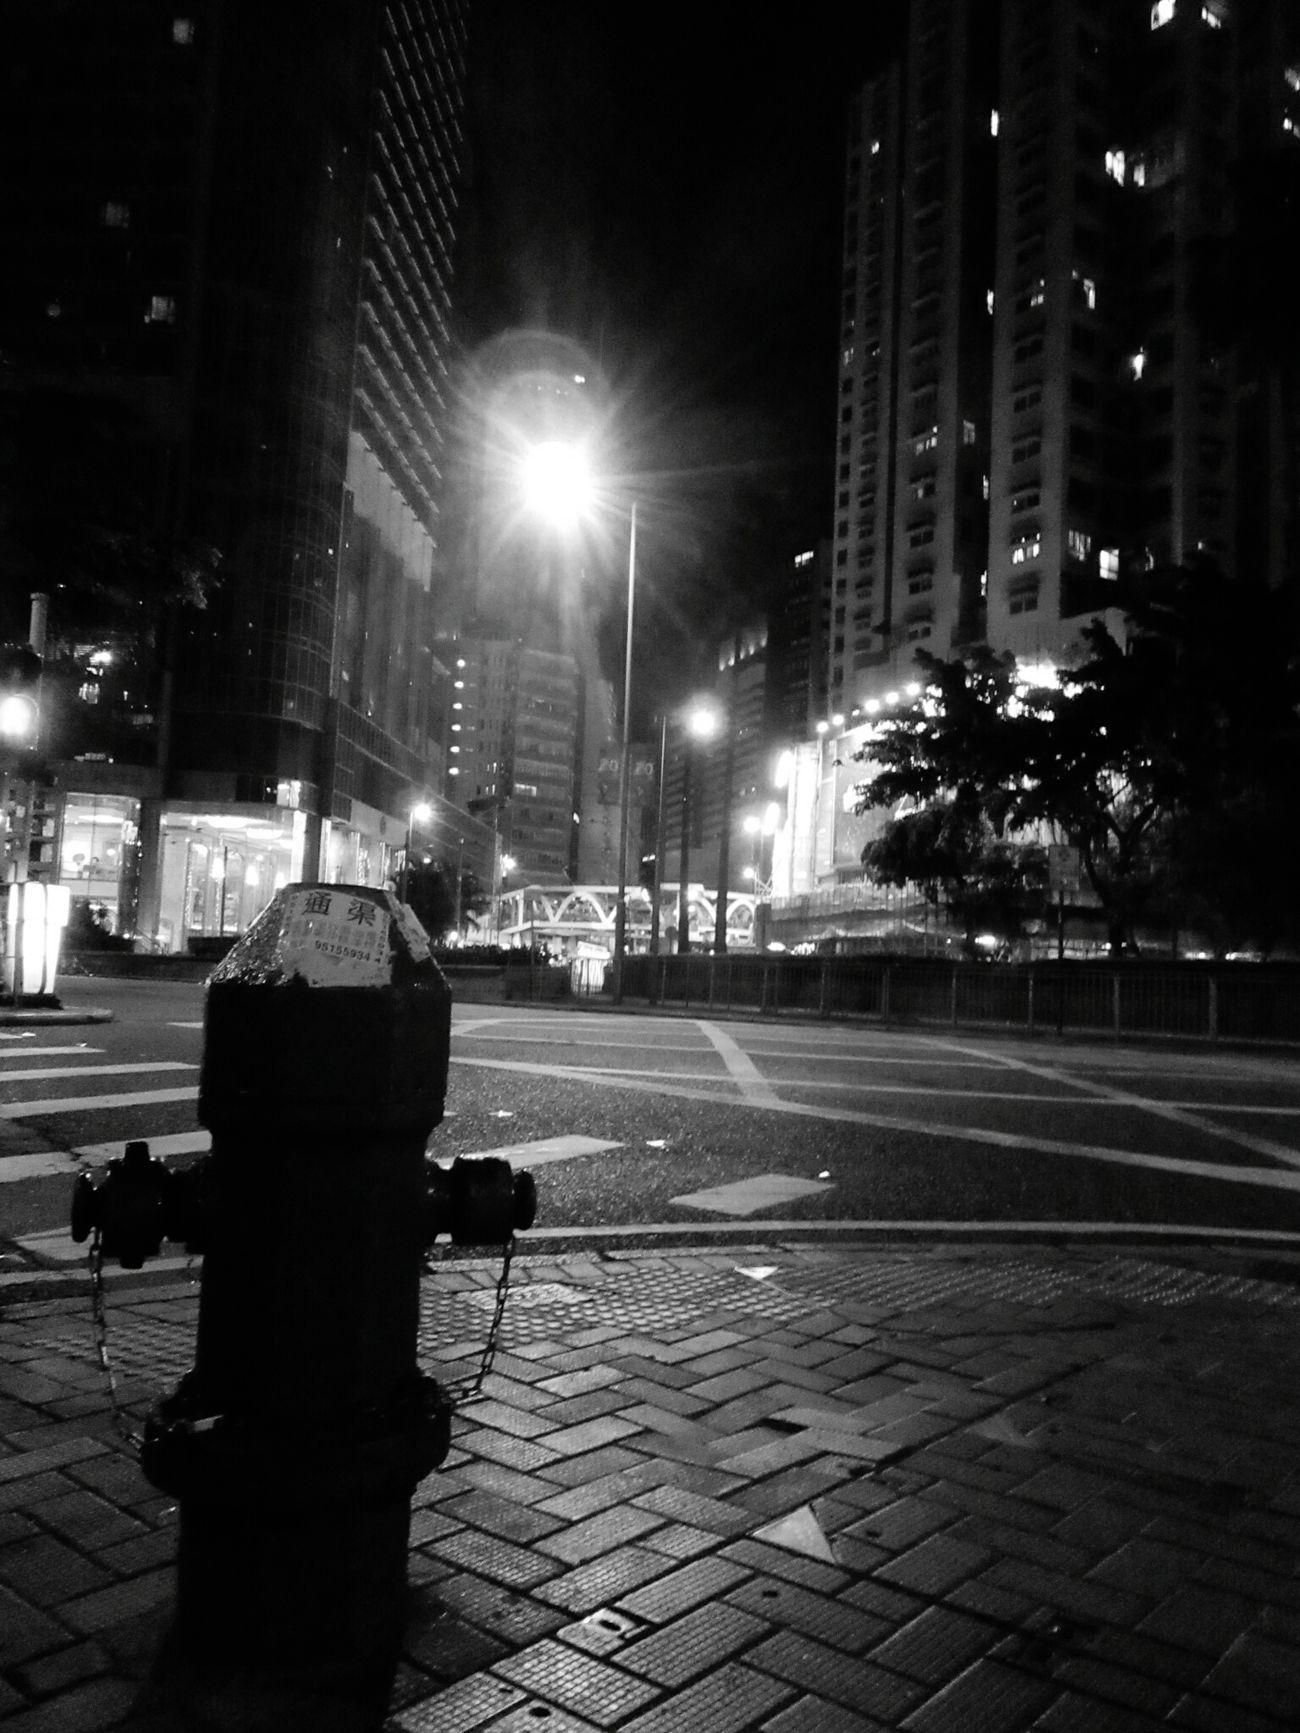 No People The Street Photographer - 2017 EyeEm Awards Public Transportation Illuminated City Night City Street Street Photography HongKong Hongkongphotography Hongkonglife Hongkongcollection Hong Kong City Hongkongcity Hongkongstreet B&w Street Photography Black And White Hongkong Black&white Fortheloveofblackandwhite Blackandwhite Blackandwhite Photography